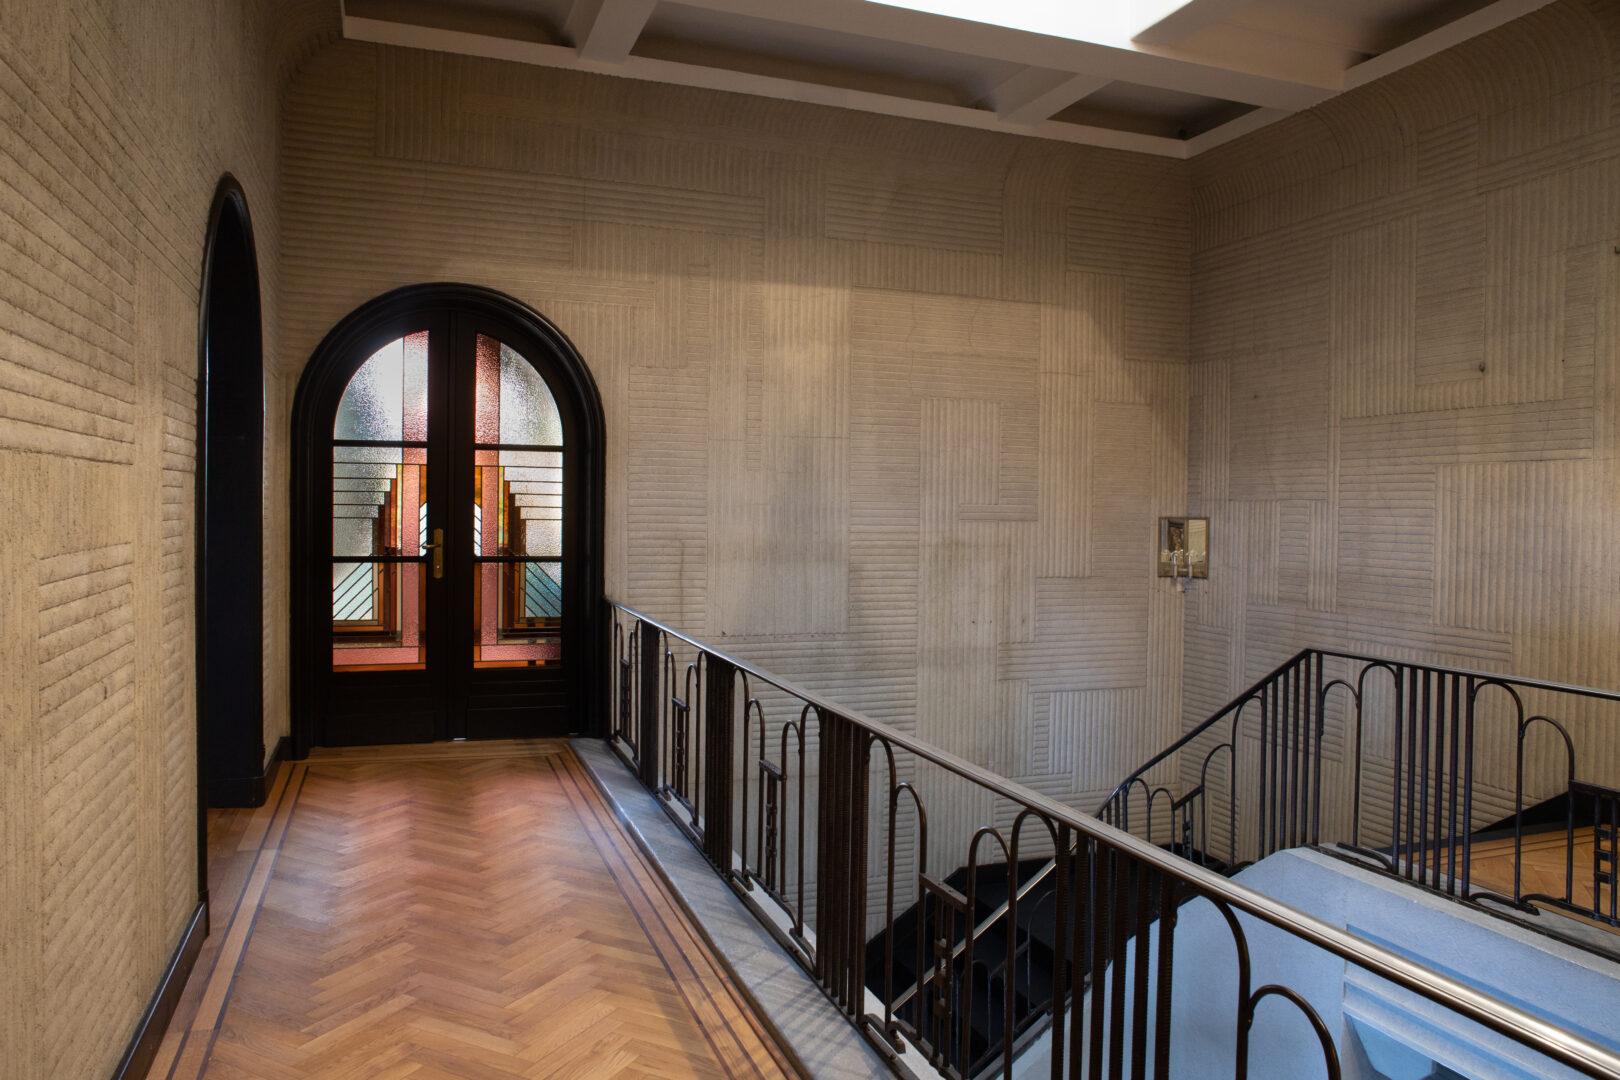 Geïntegreerd glas-in-lood in deur, passend bij historisch glas in art deco villa te Zottegem. Ontwerp: Ingrid Meyvaert (©Nadia El Makhfi)